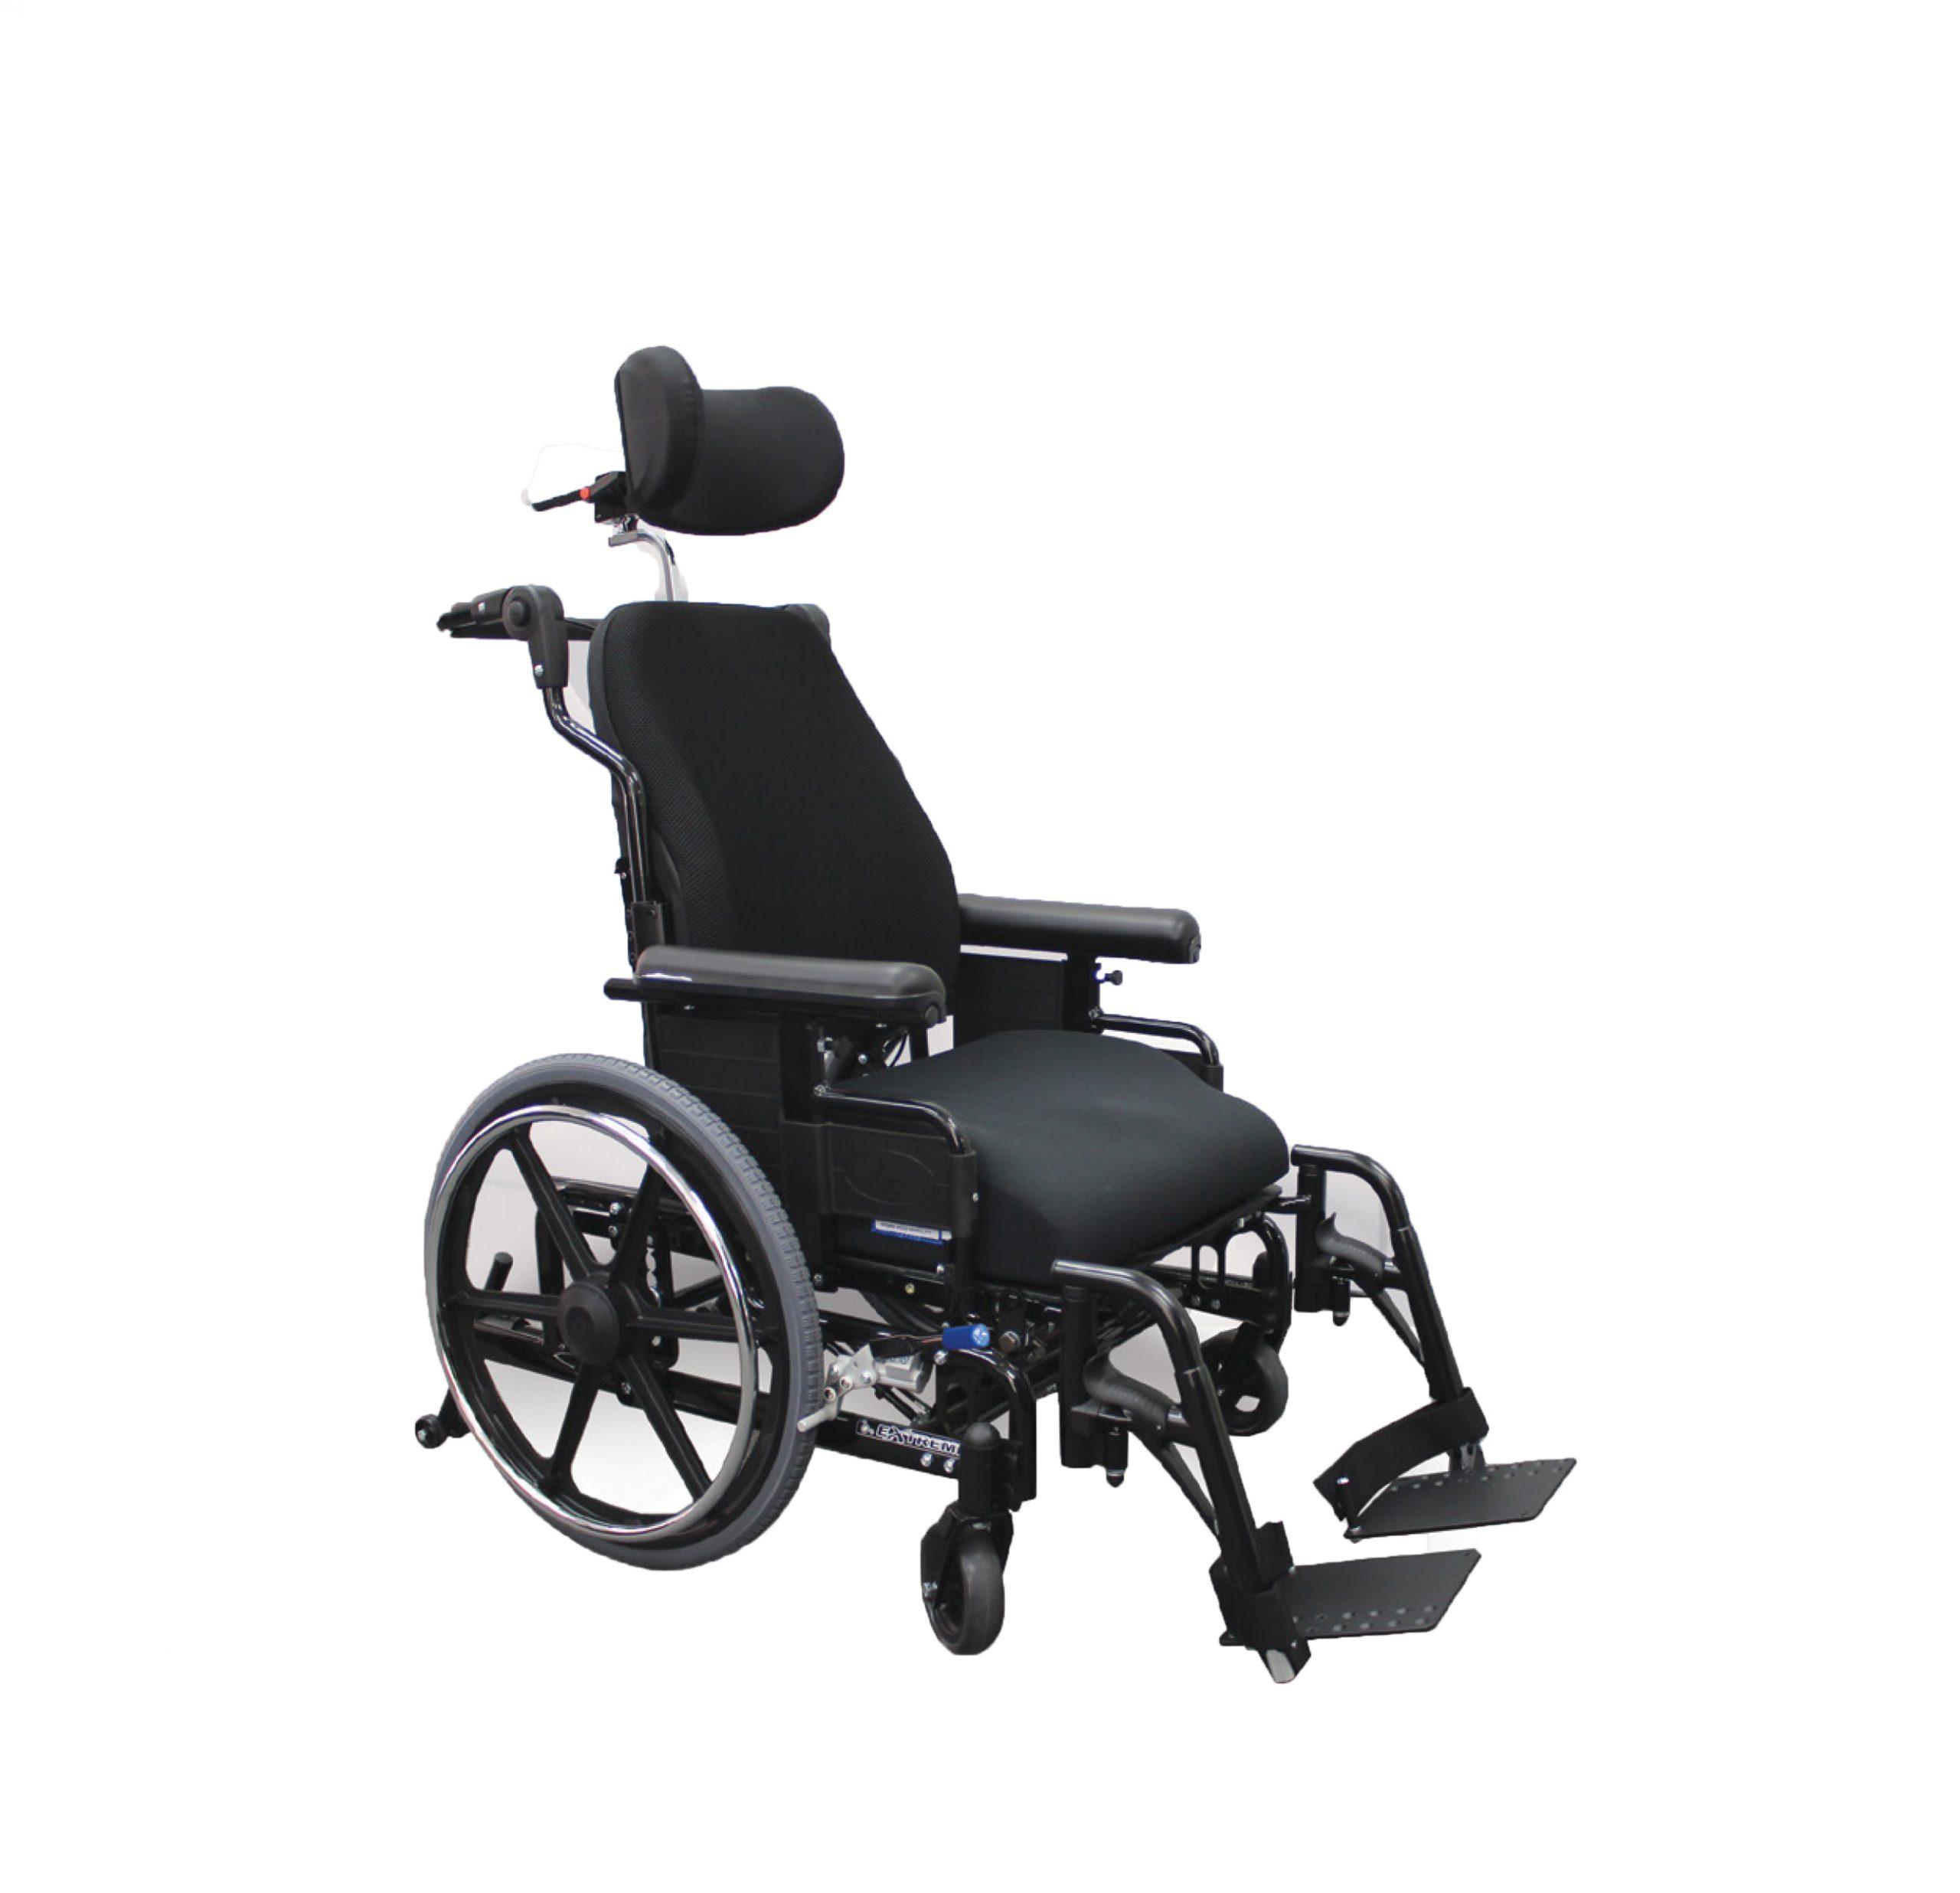 Extreme Tilt Manual Wheelchair